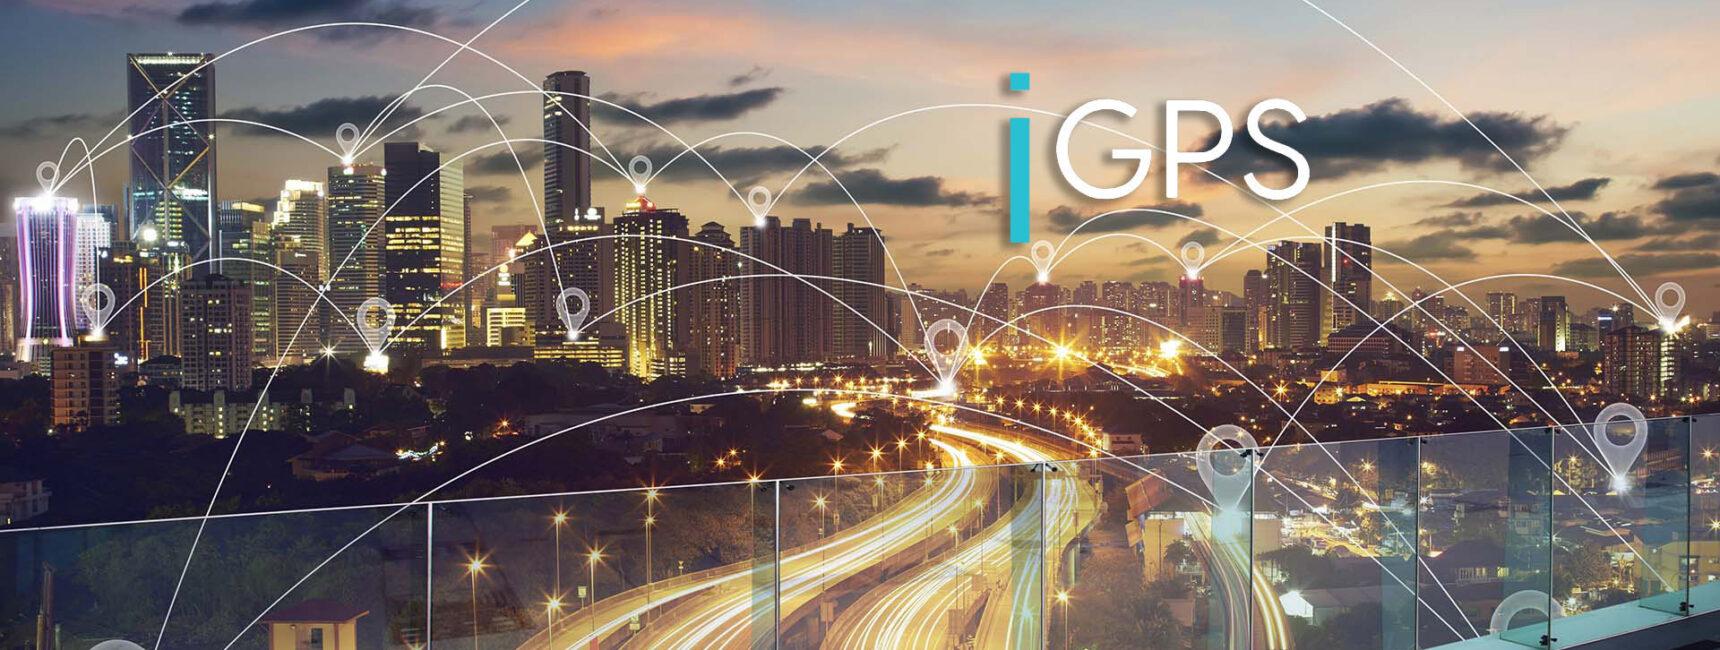 iGPS GPS Tracking Technology